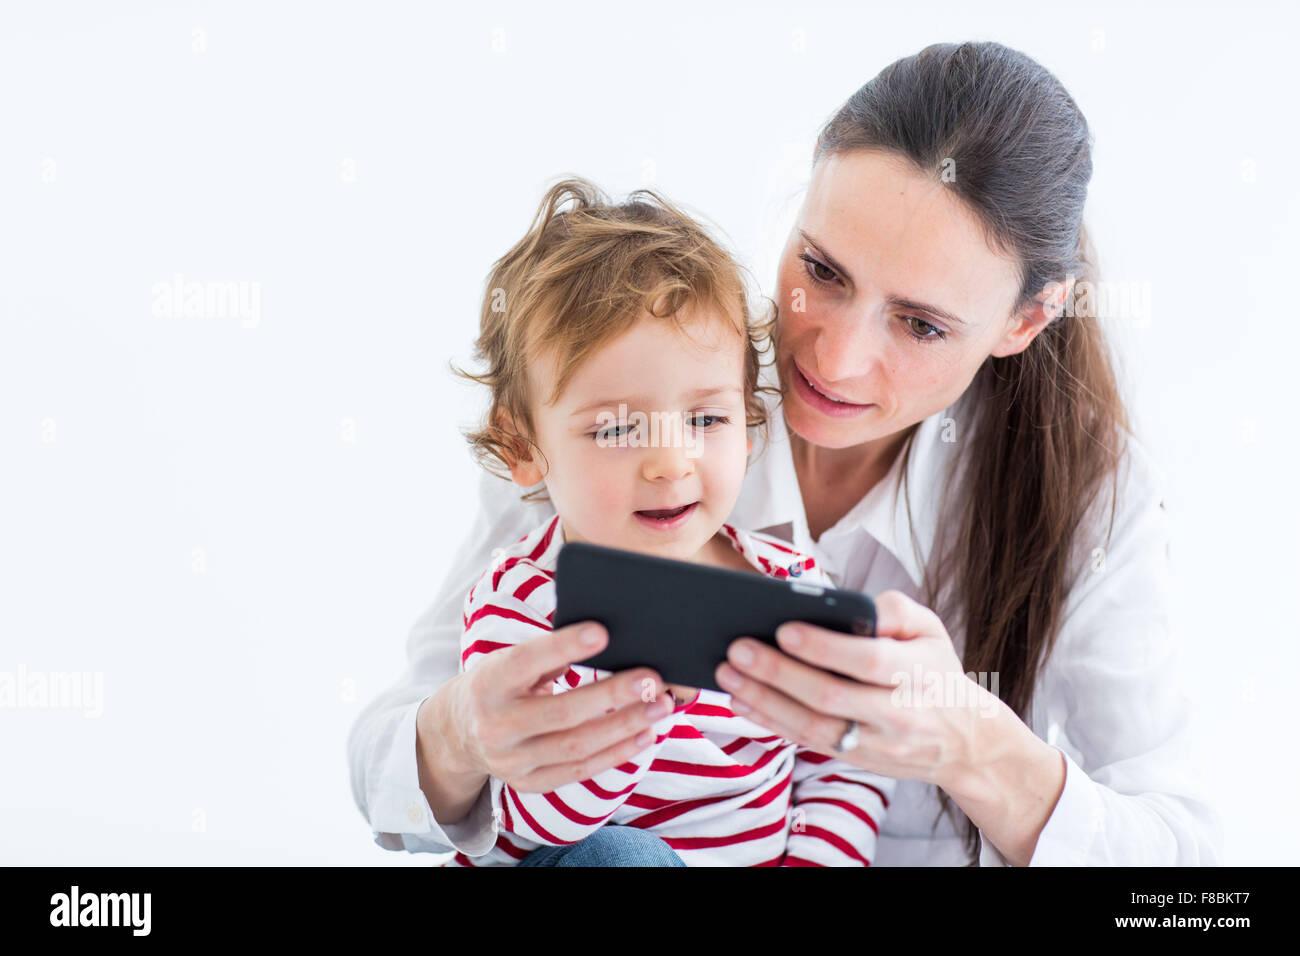 2 jähriger Junge mit Handy. Stockbild